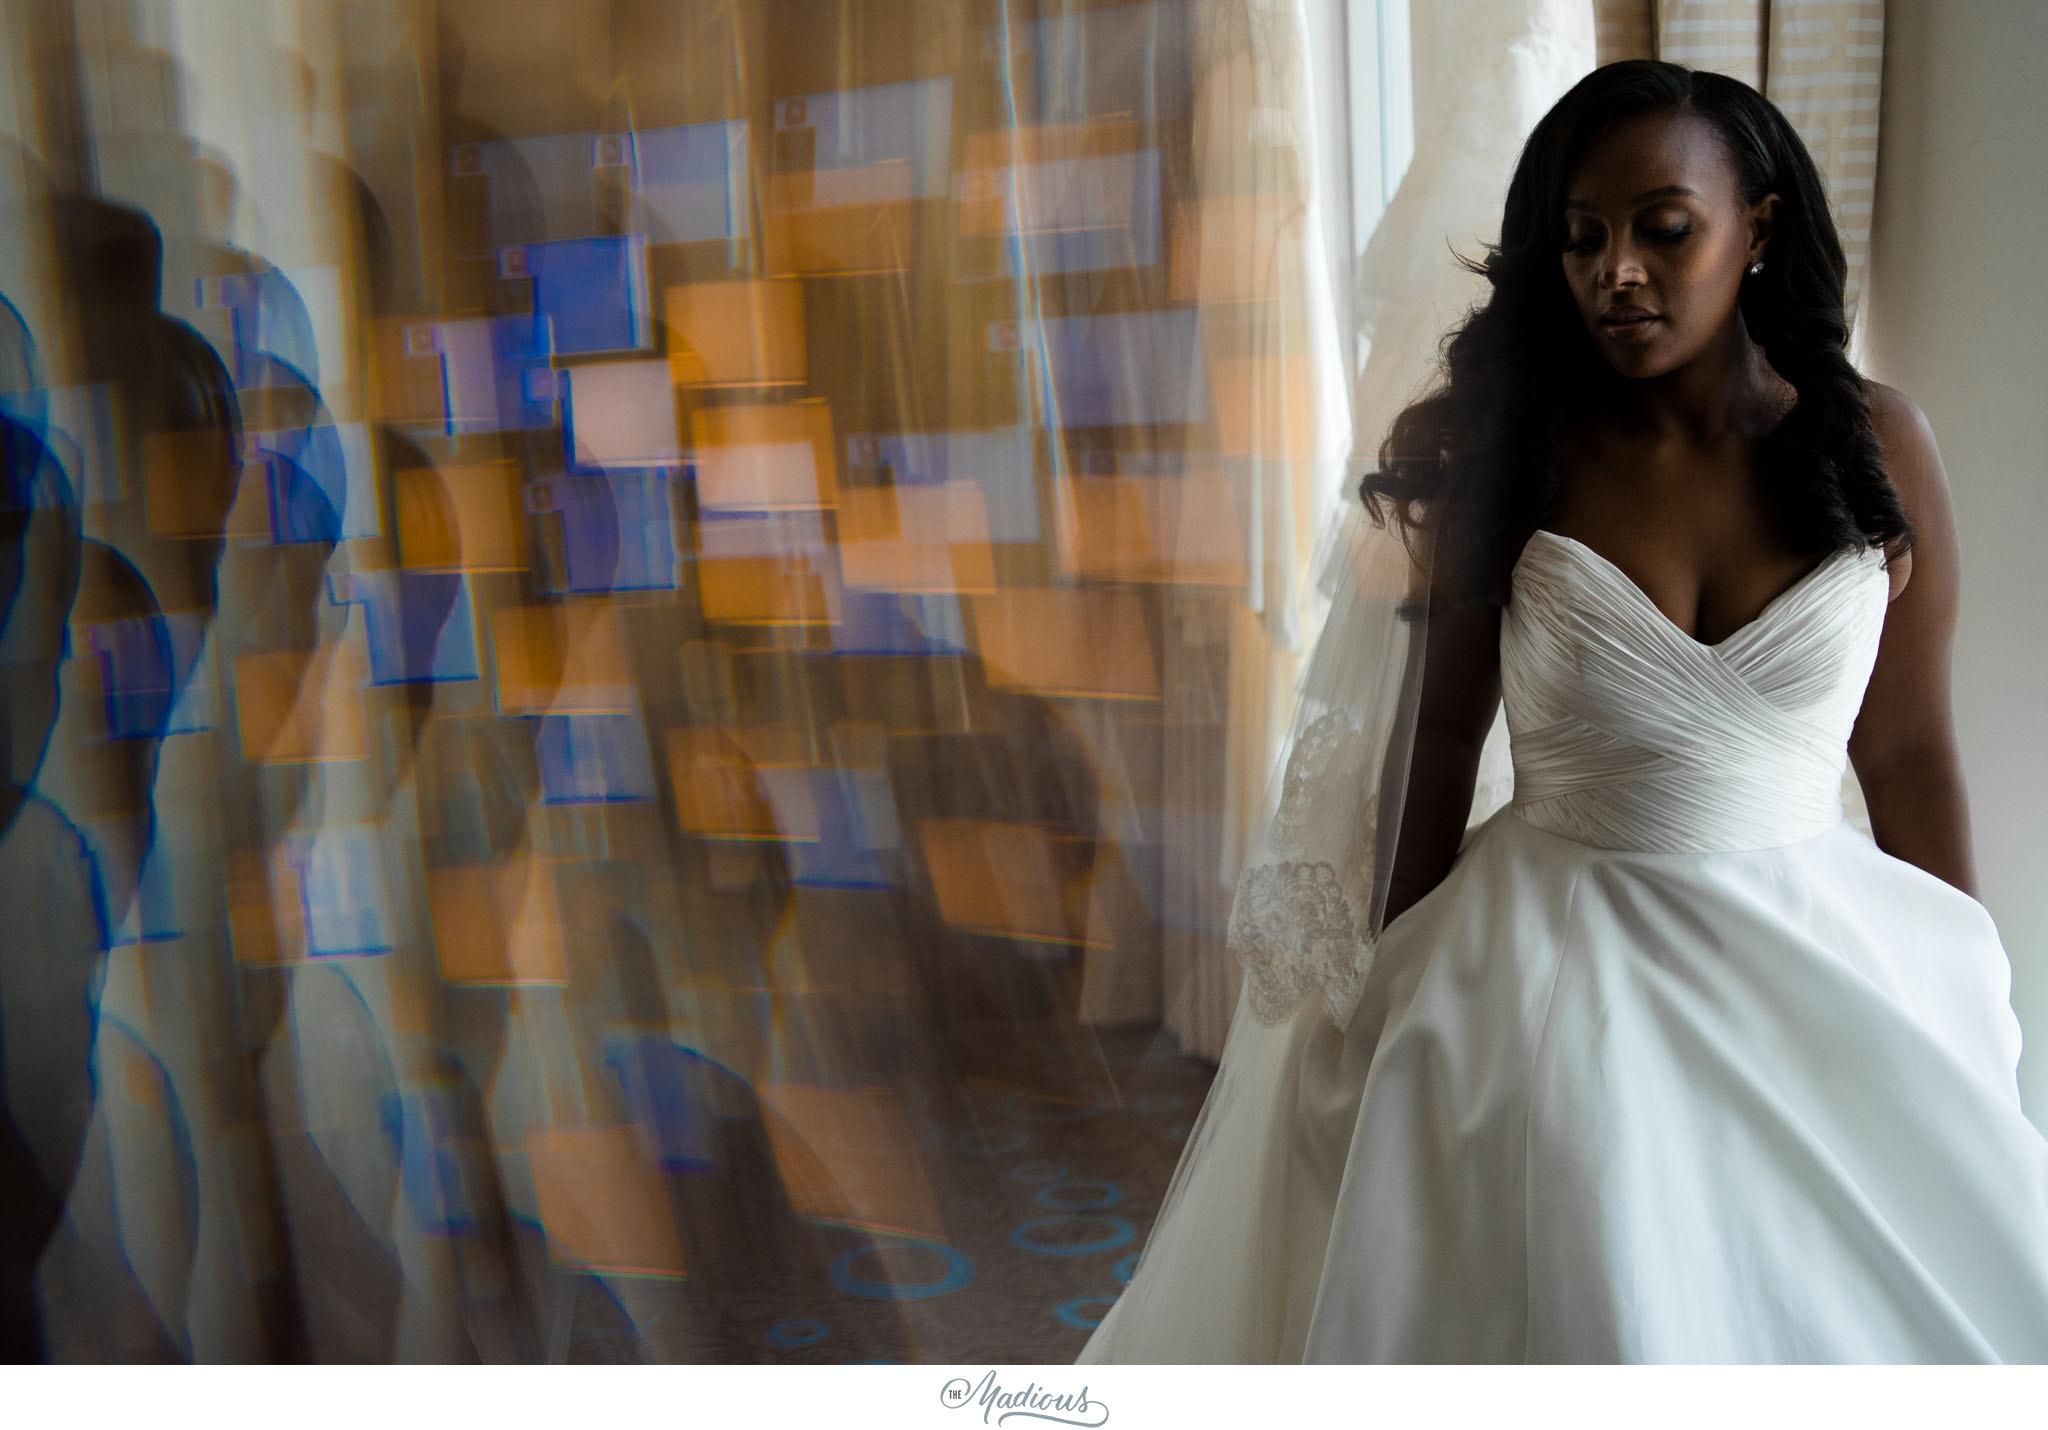 nmwa+wedding,+women+in+the+arts+wedding,+ethiopian+wedding,+dc+wedding+0012.jpg